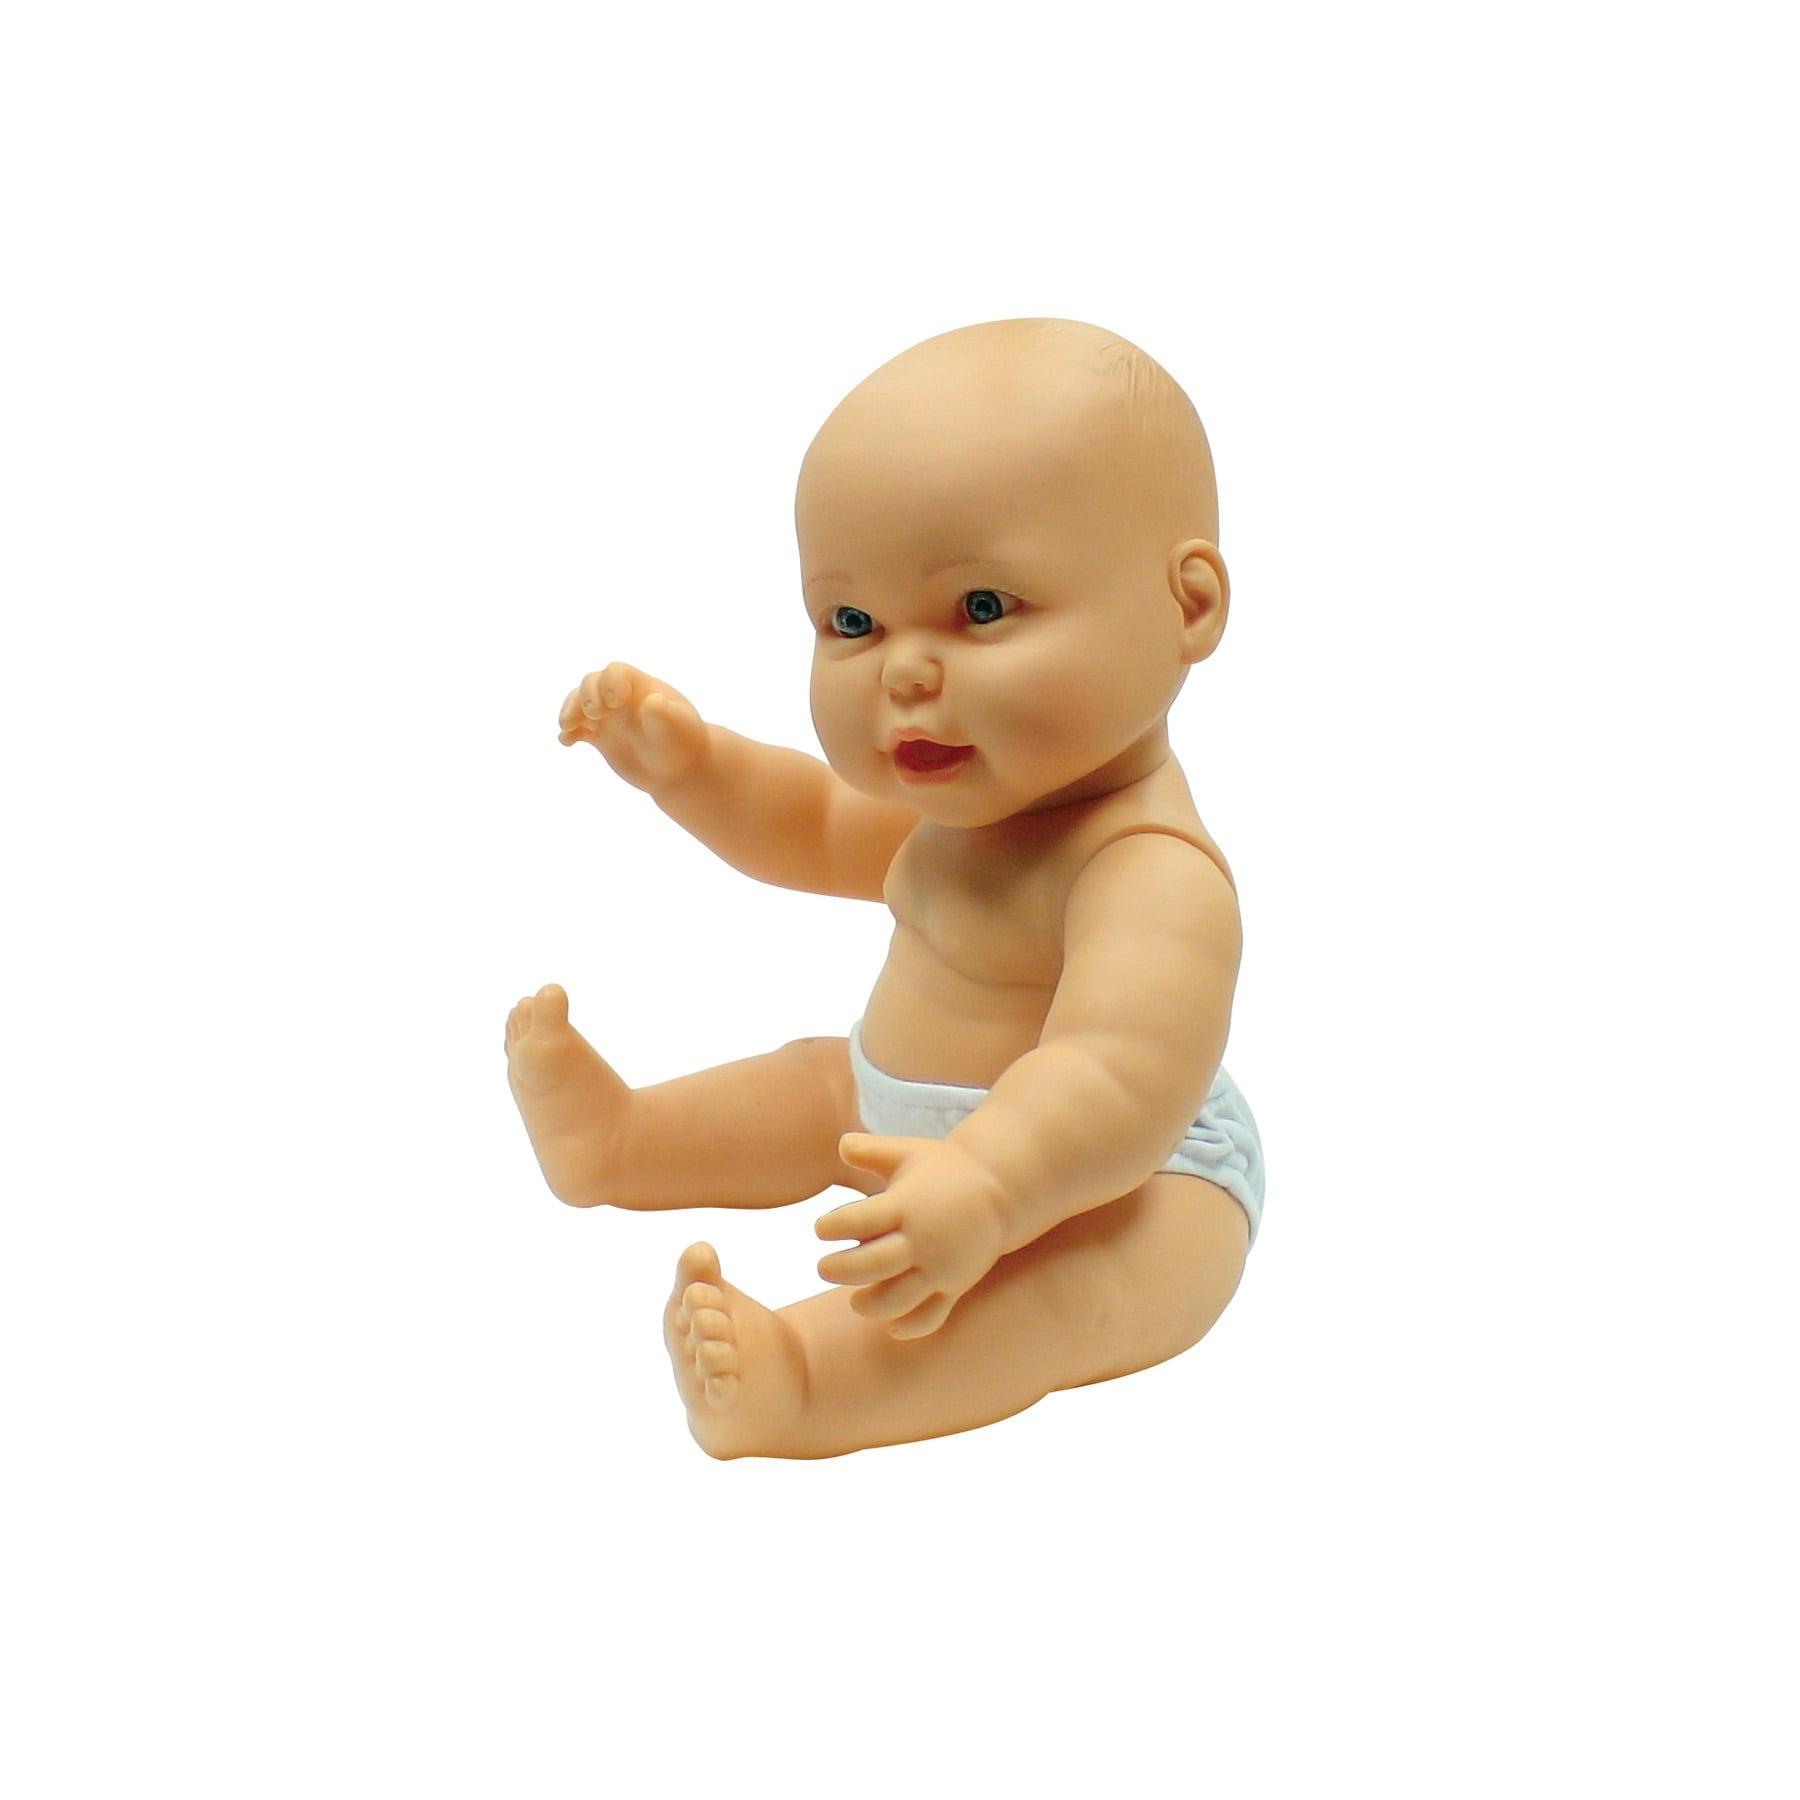 "Get Ready Kids Caucasian 18"" Vinyl Baby Doll, Gender Neut..."